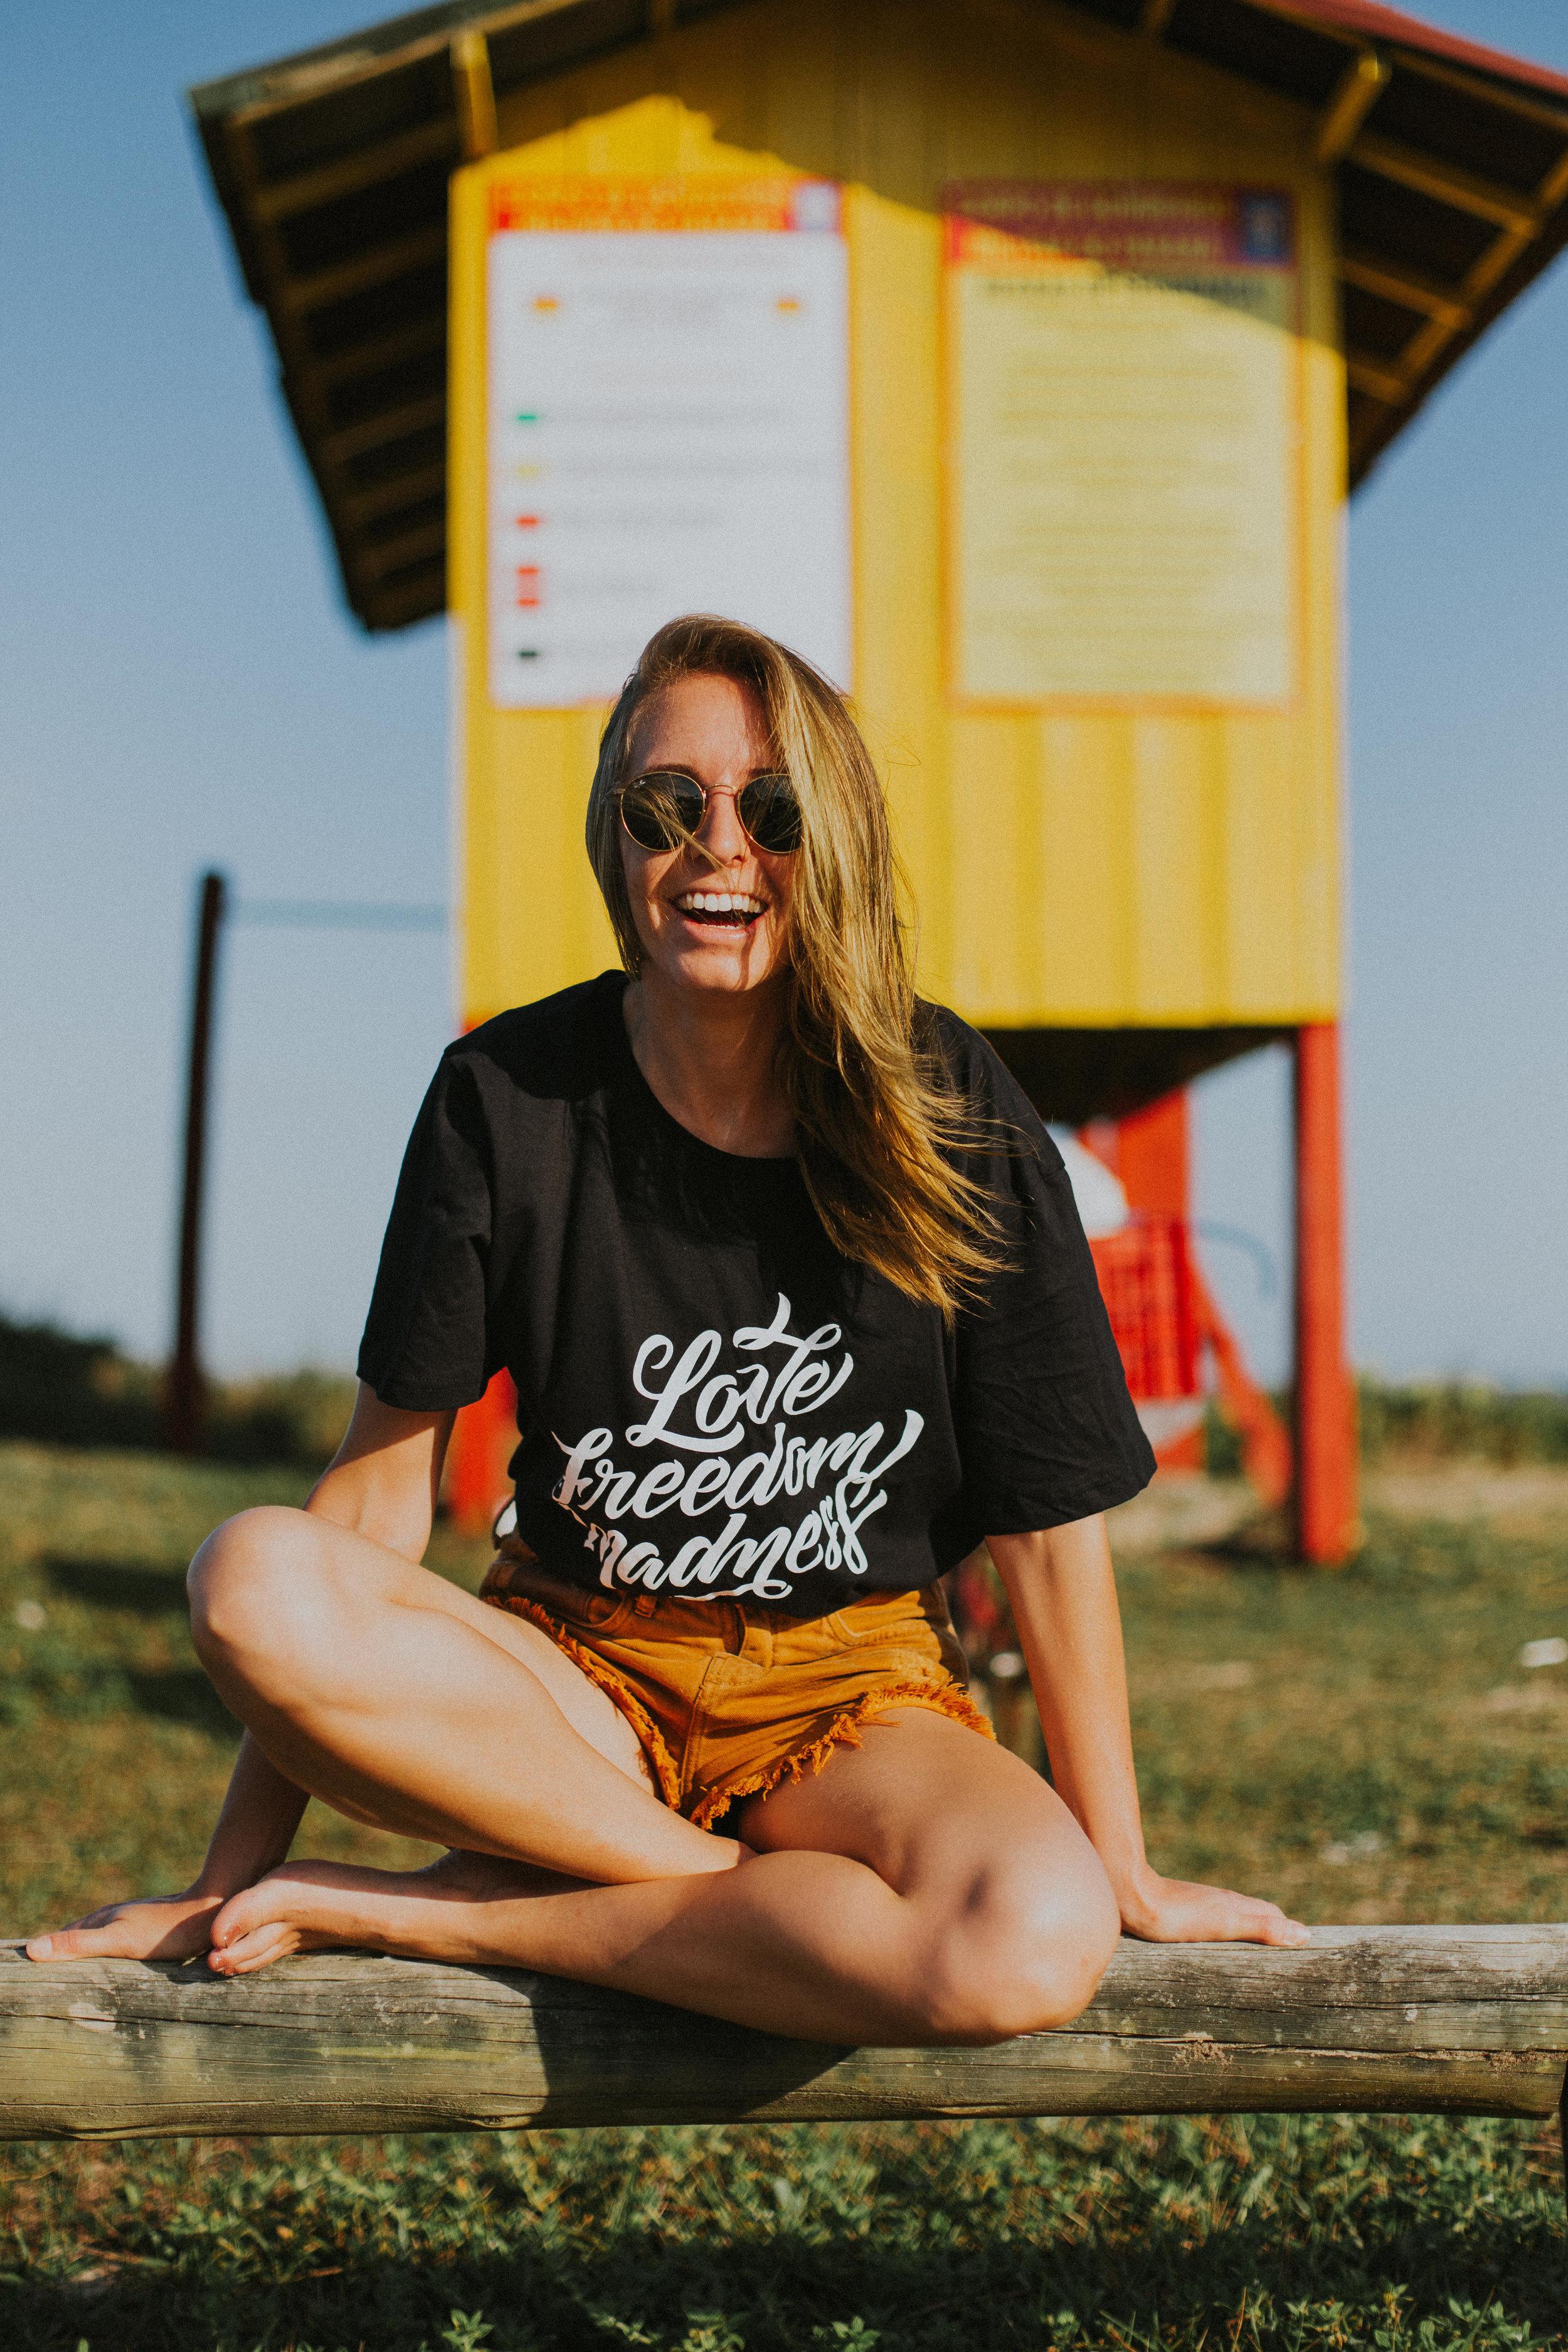 Gaby-Braun-Love-Freedom-Madness-Model-Brazil-t-shirt-beach-praia-ensaio-campanha-fotos-na-praia-ricardo-franzen-2.jpg